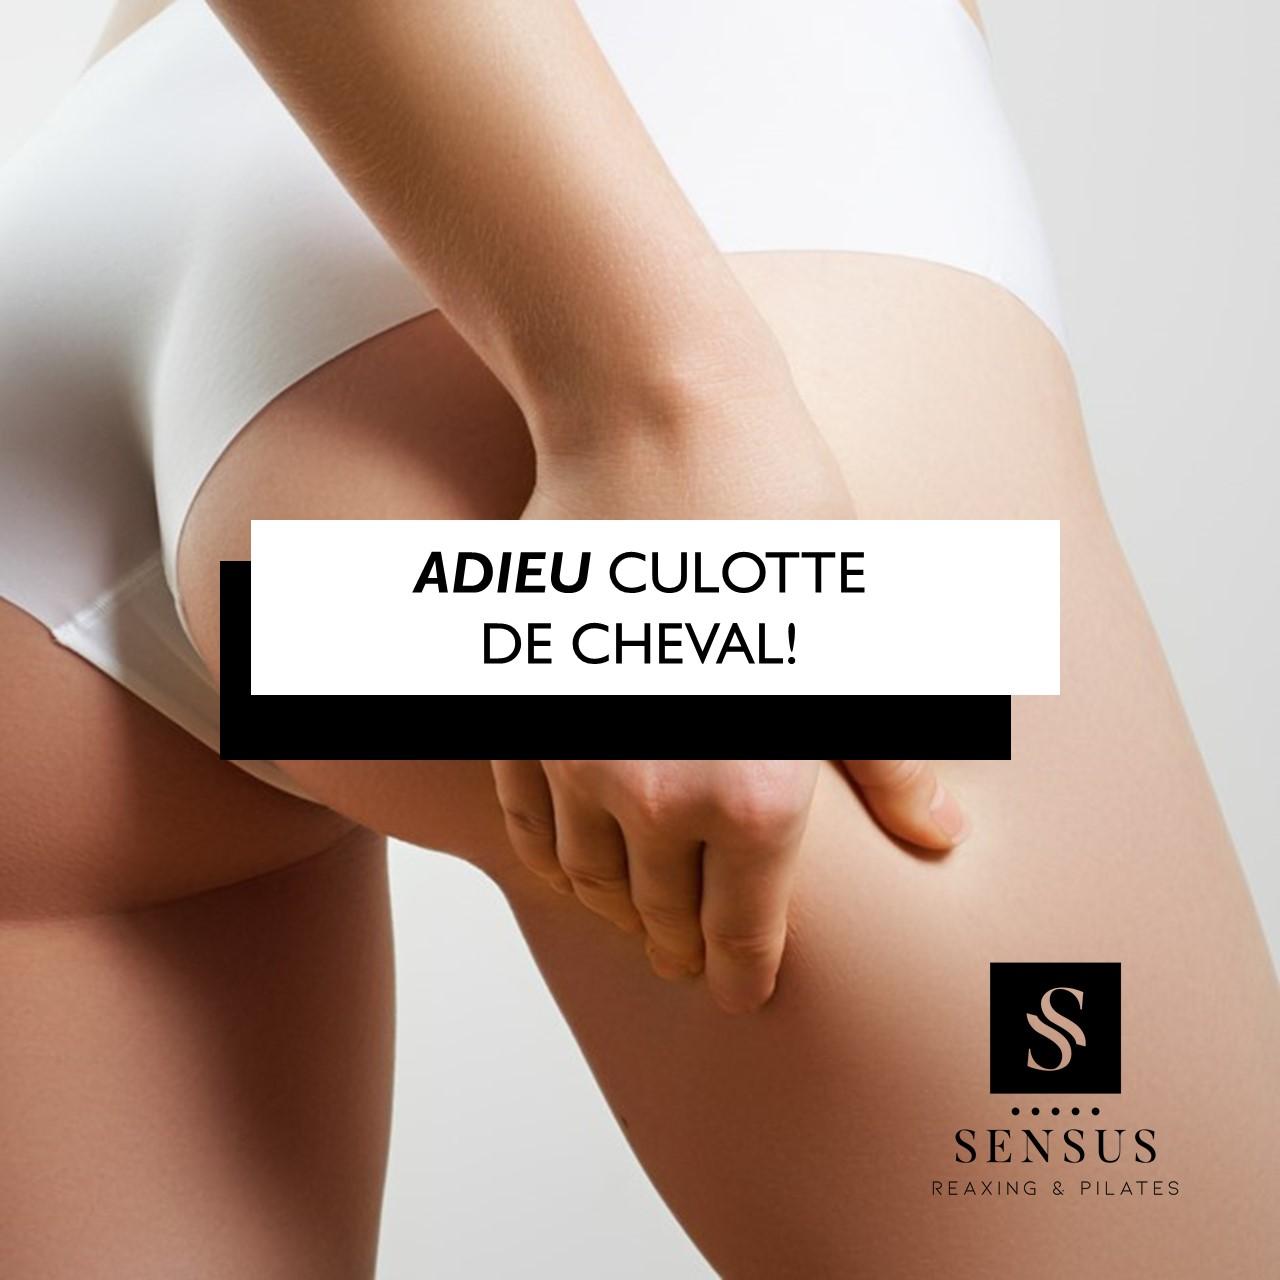 Adieu Culotte De Cheval!